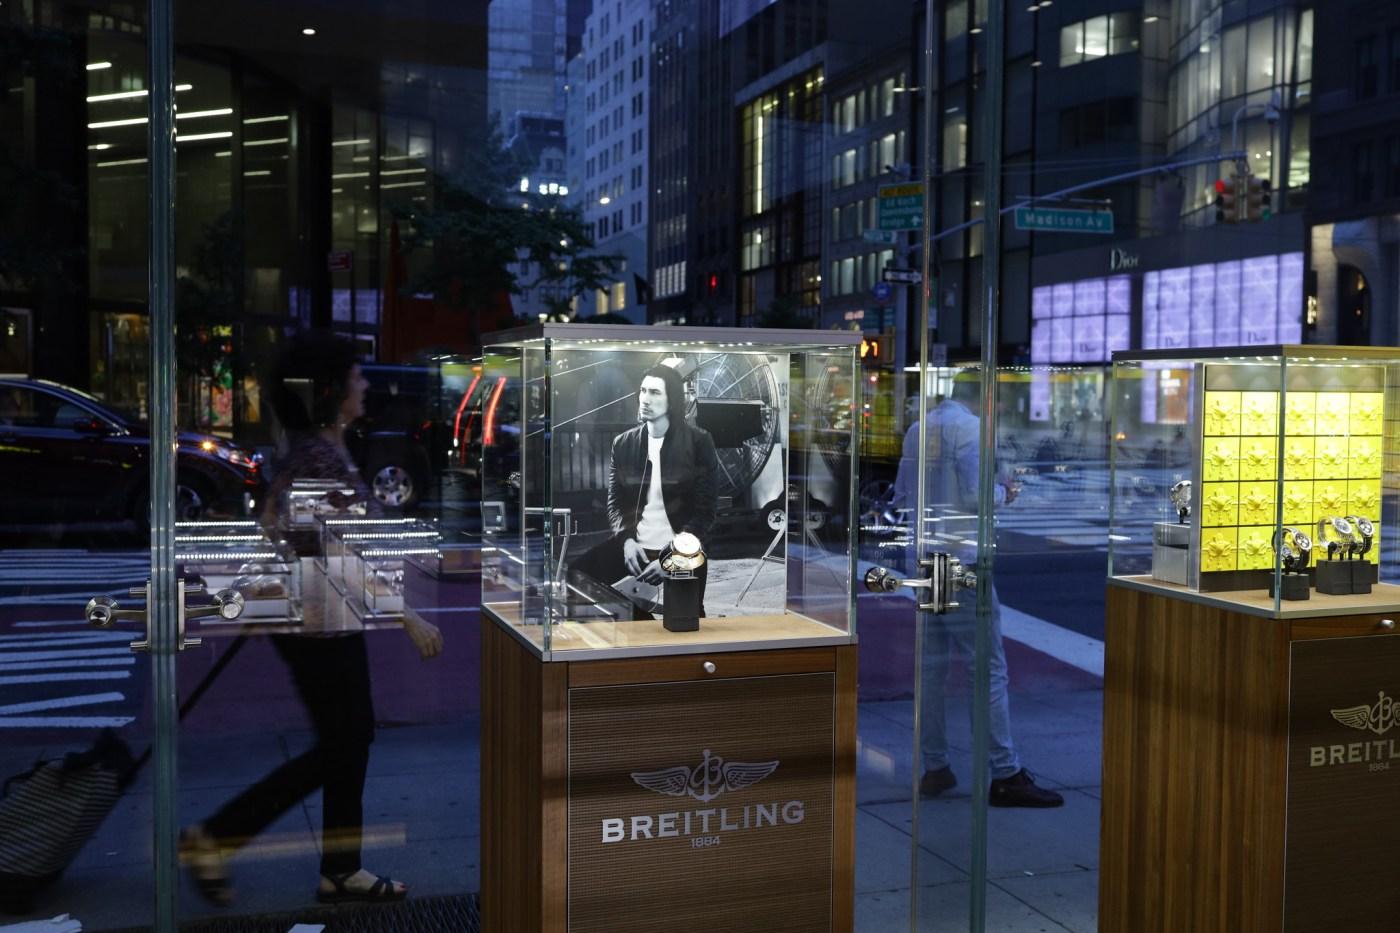 Breitling boutique 575 Madison Avenue